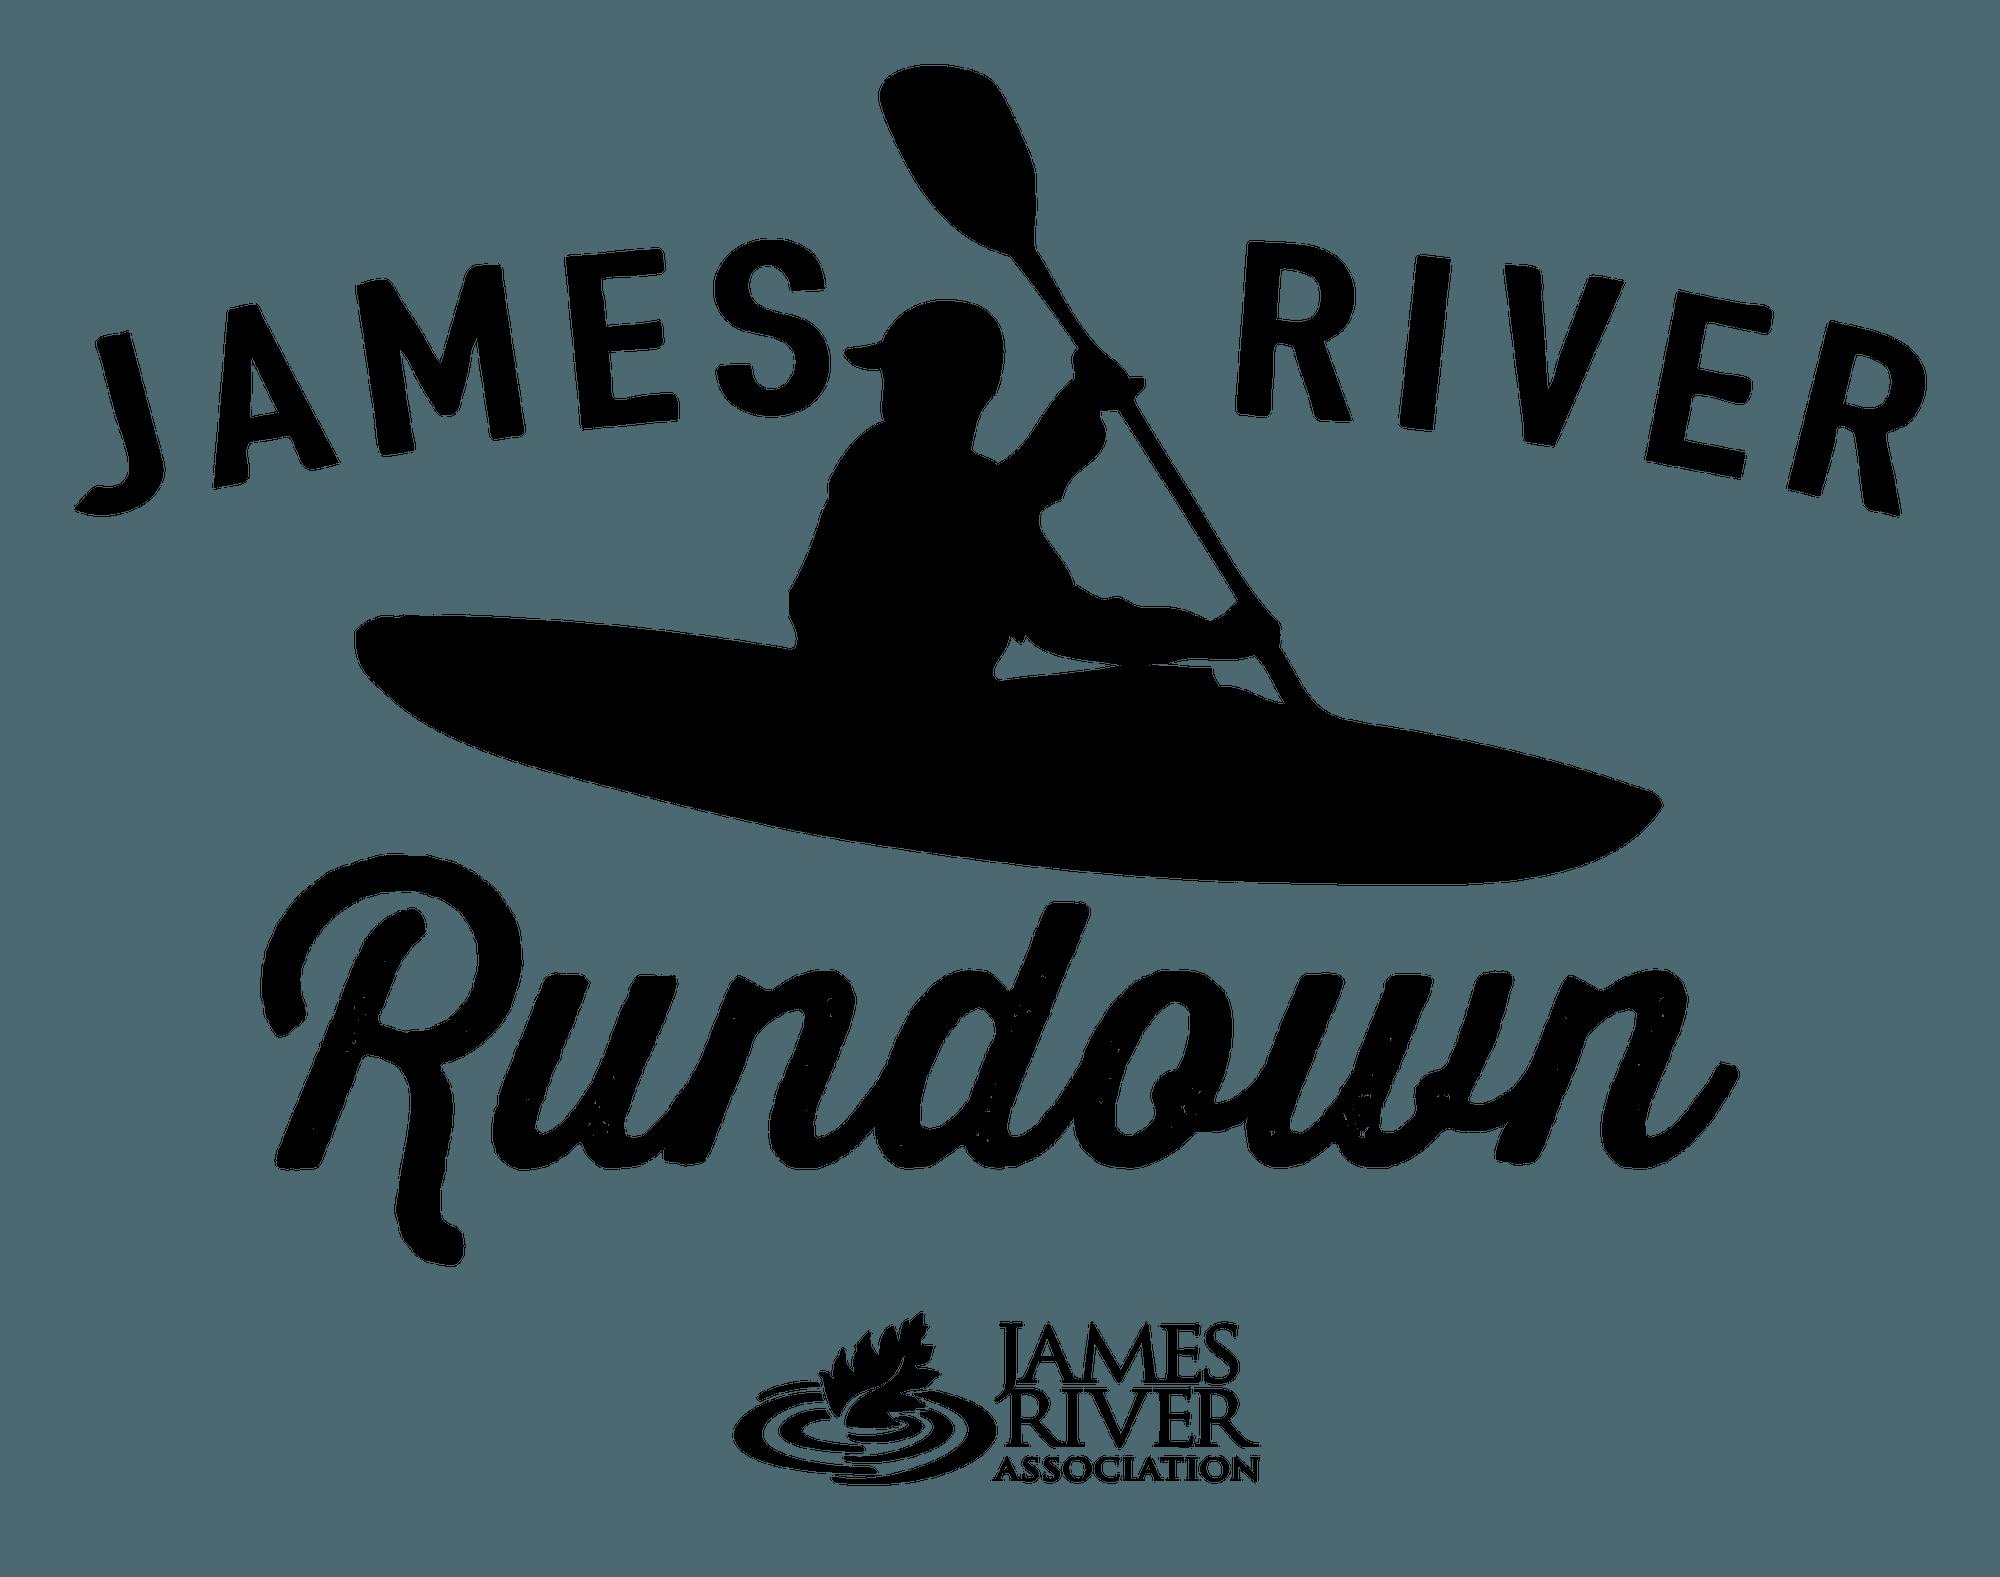 James River Rundown_black_final